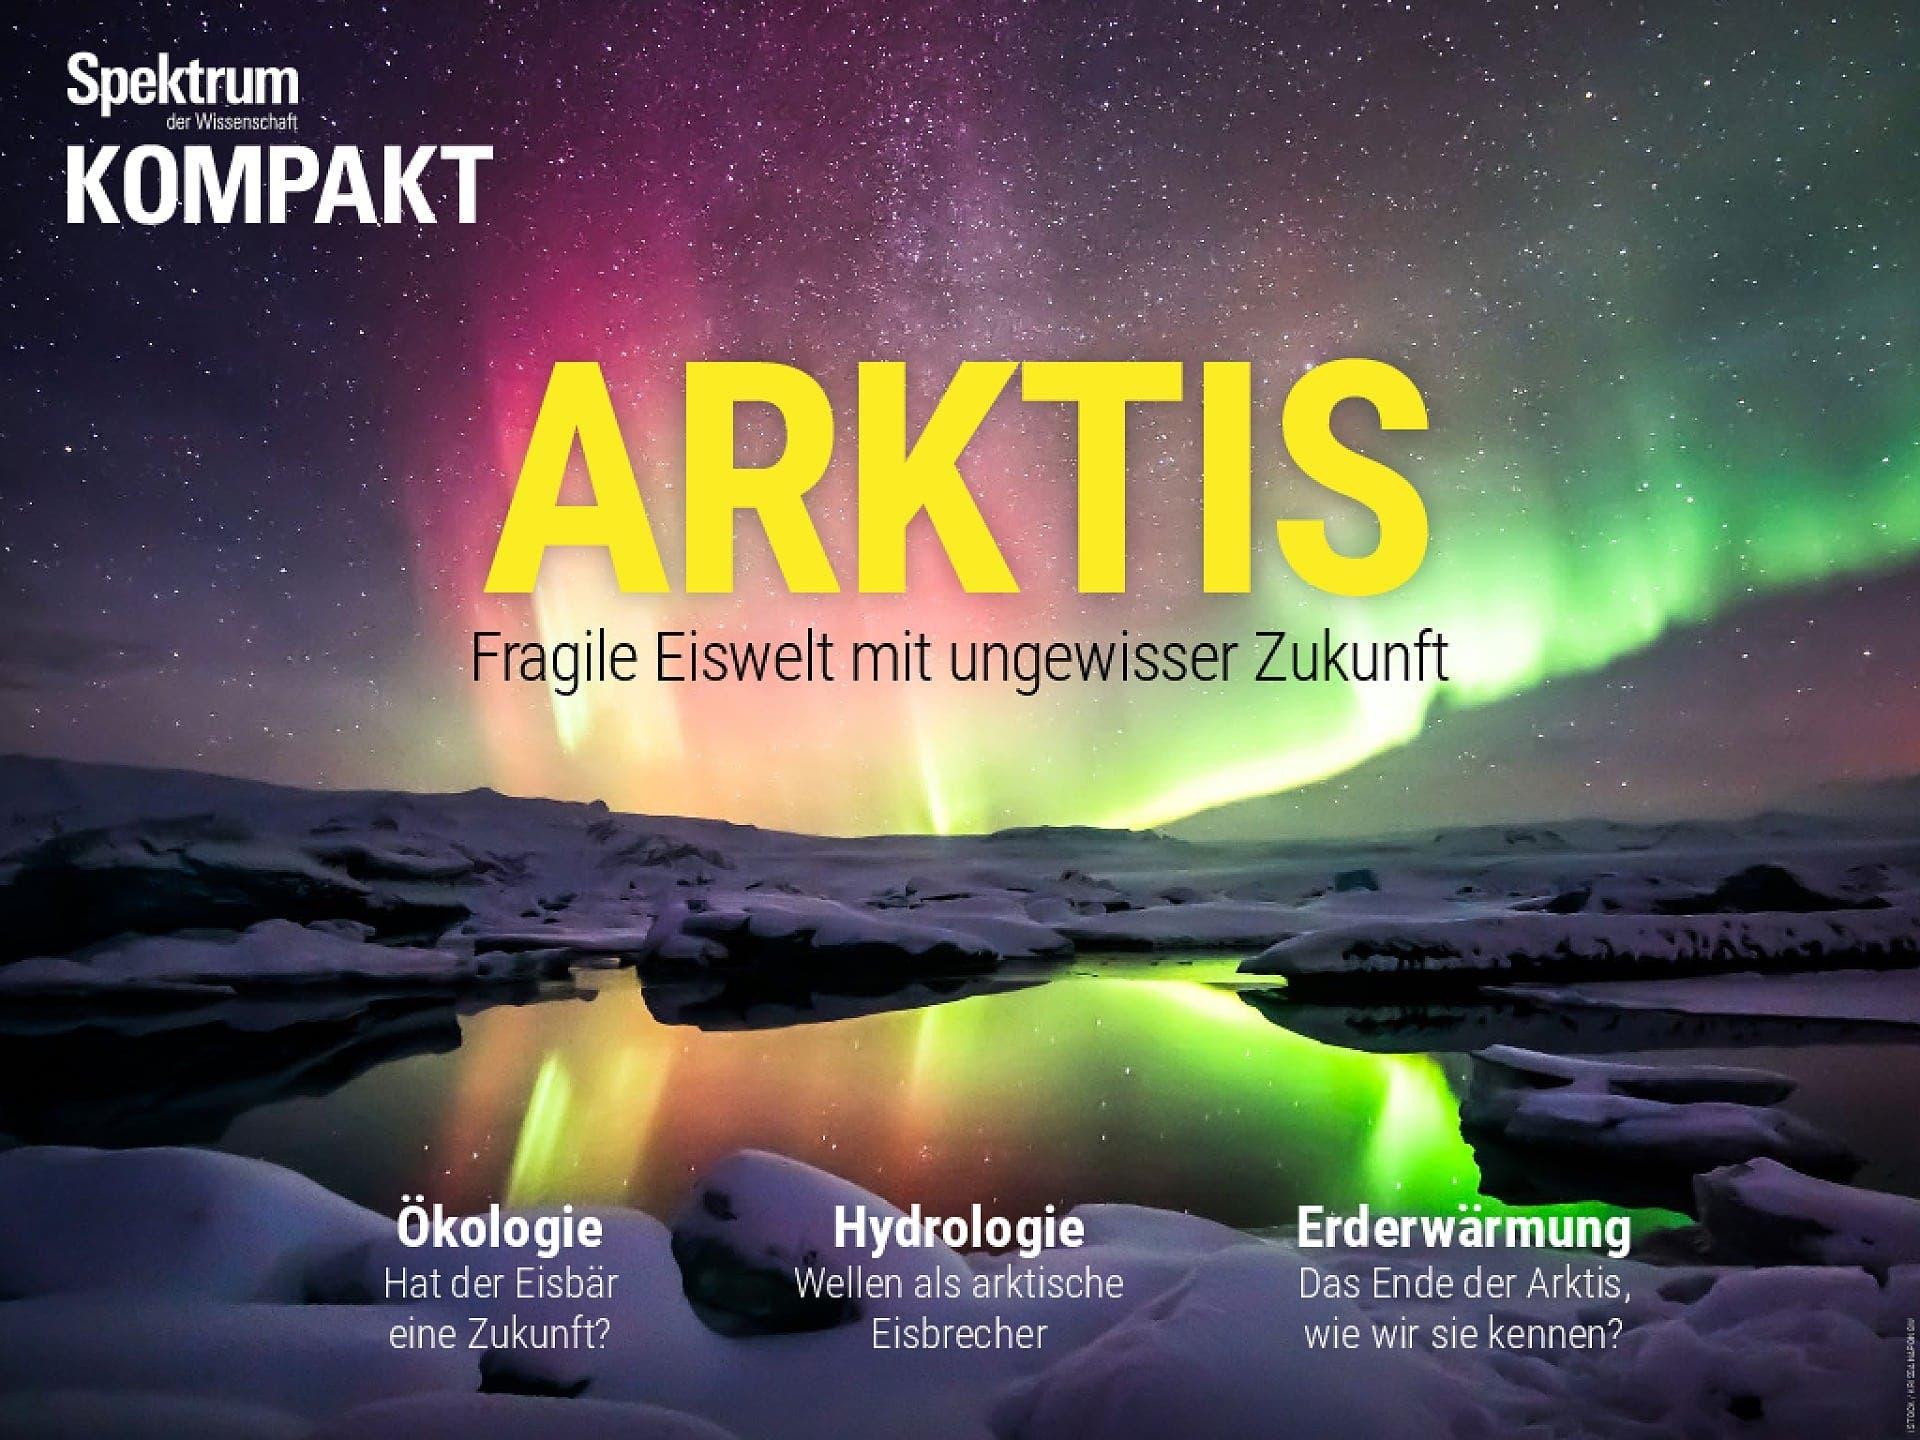 Arktis - Fragile Eiswelt